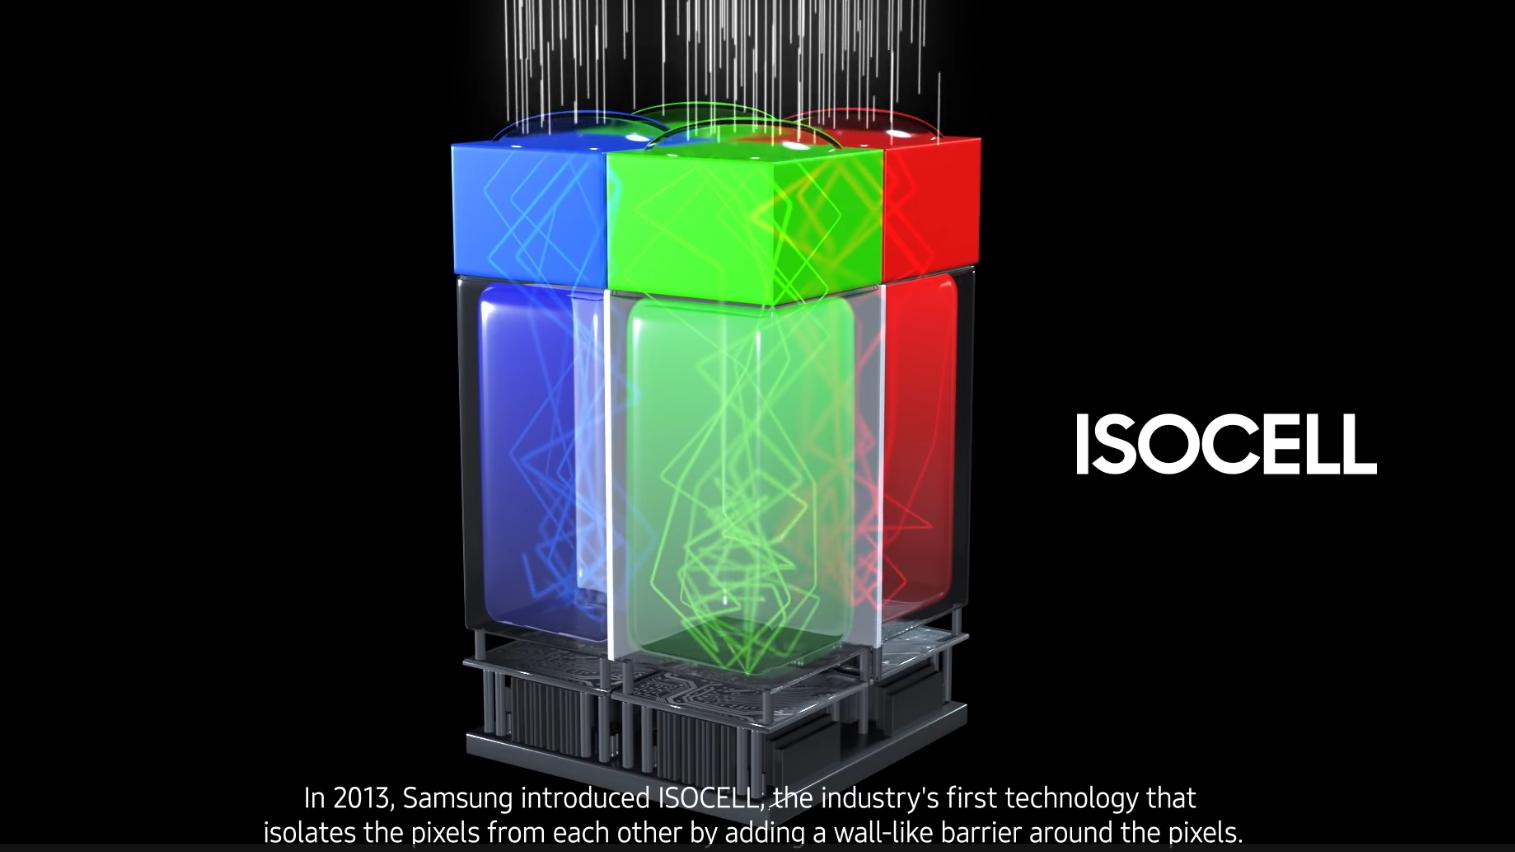 Технология ISOCELL от компании Samsung